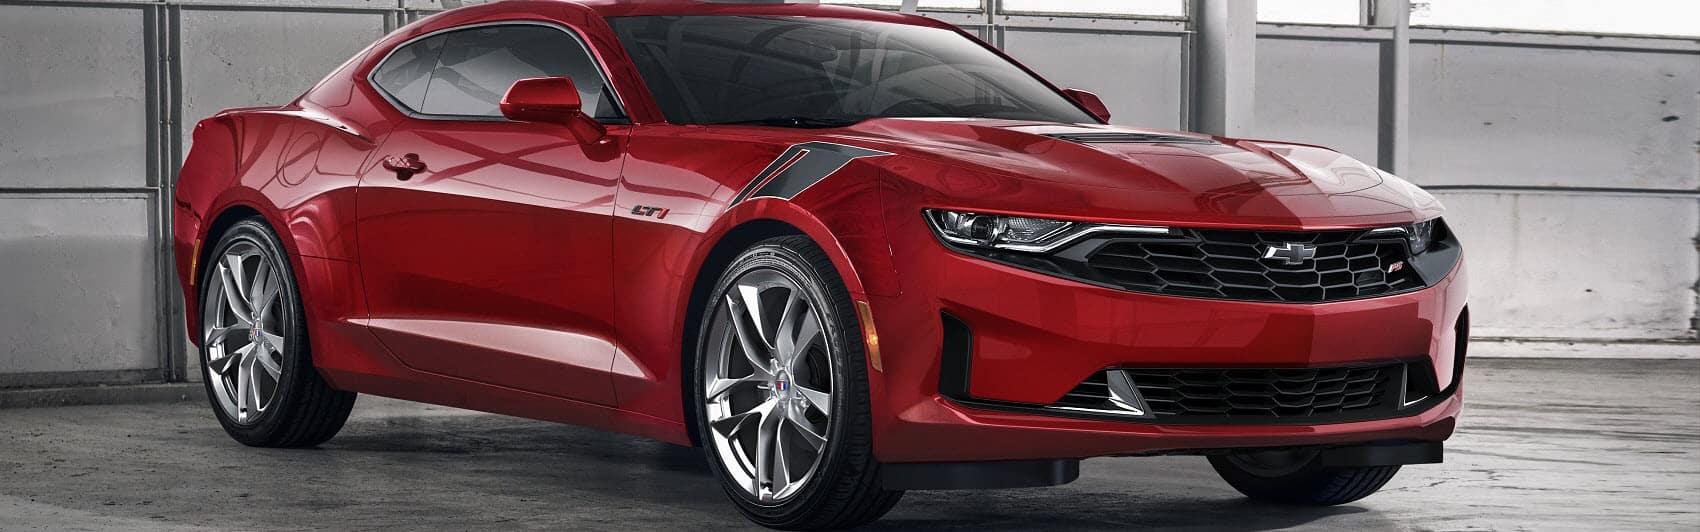 Key Chevrolet Car Reviews Middletown, CT